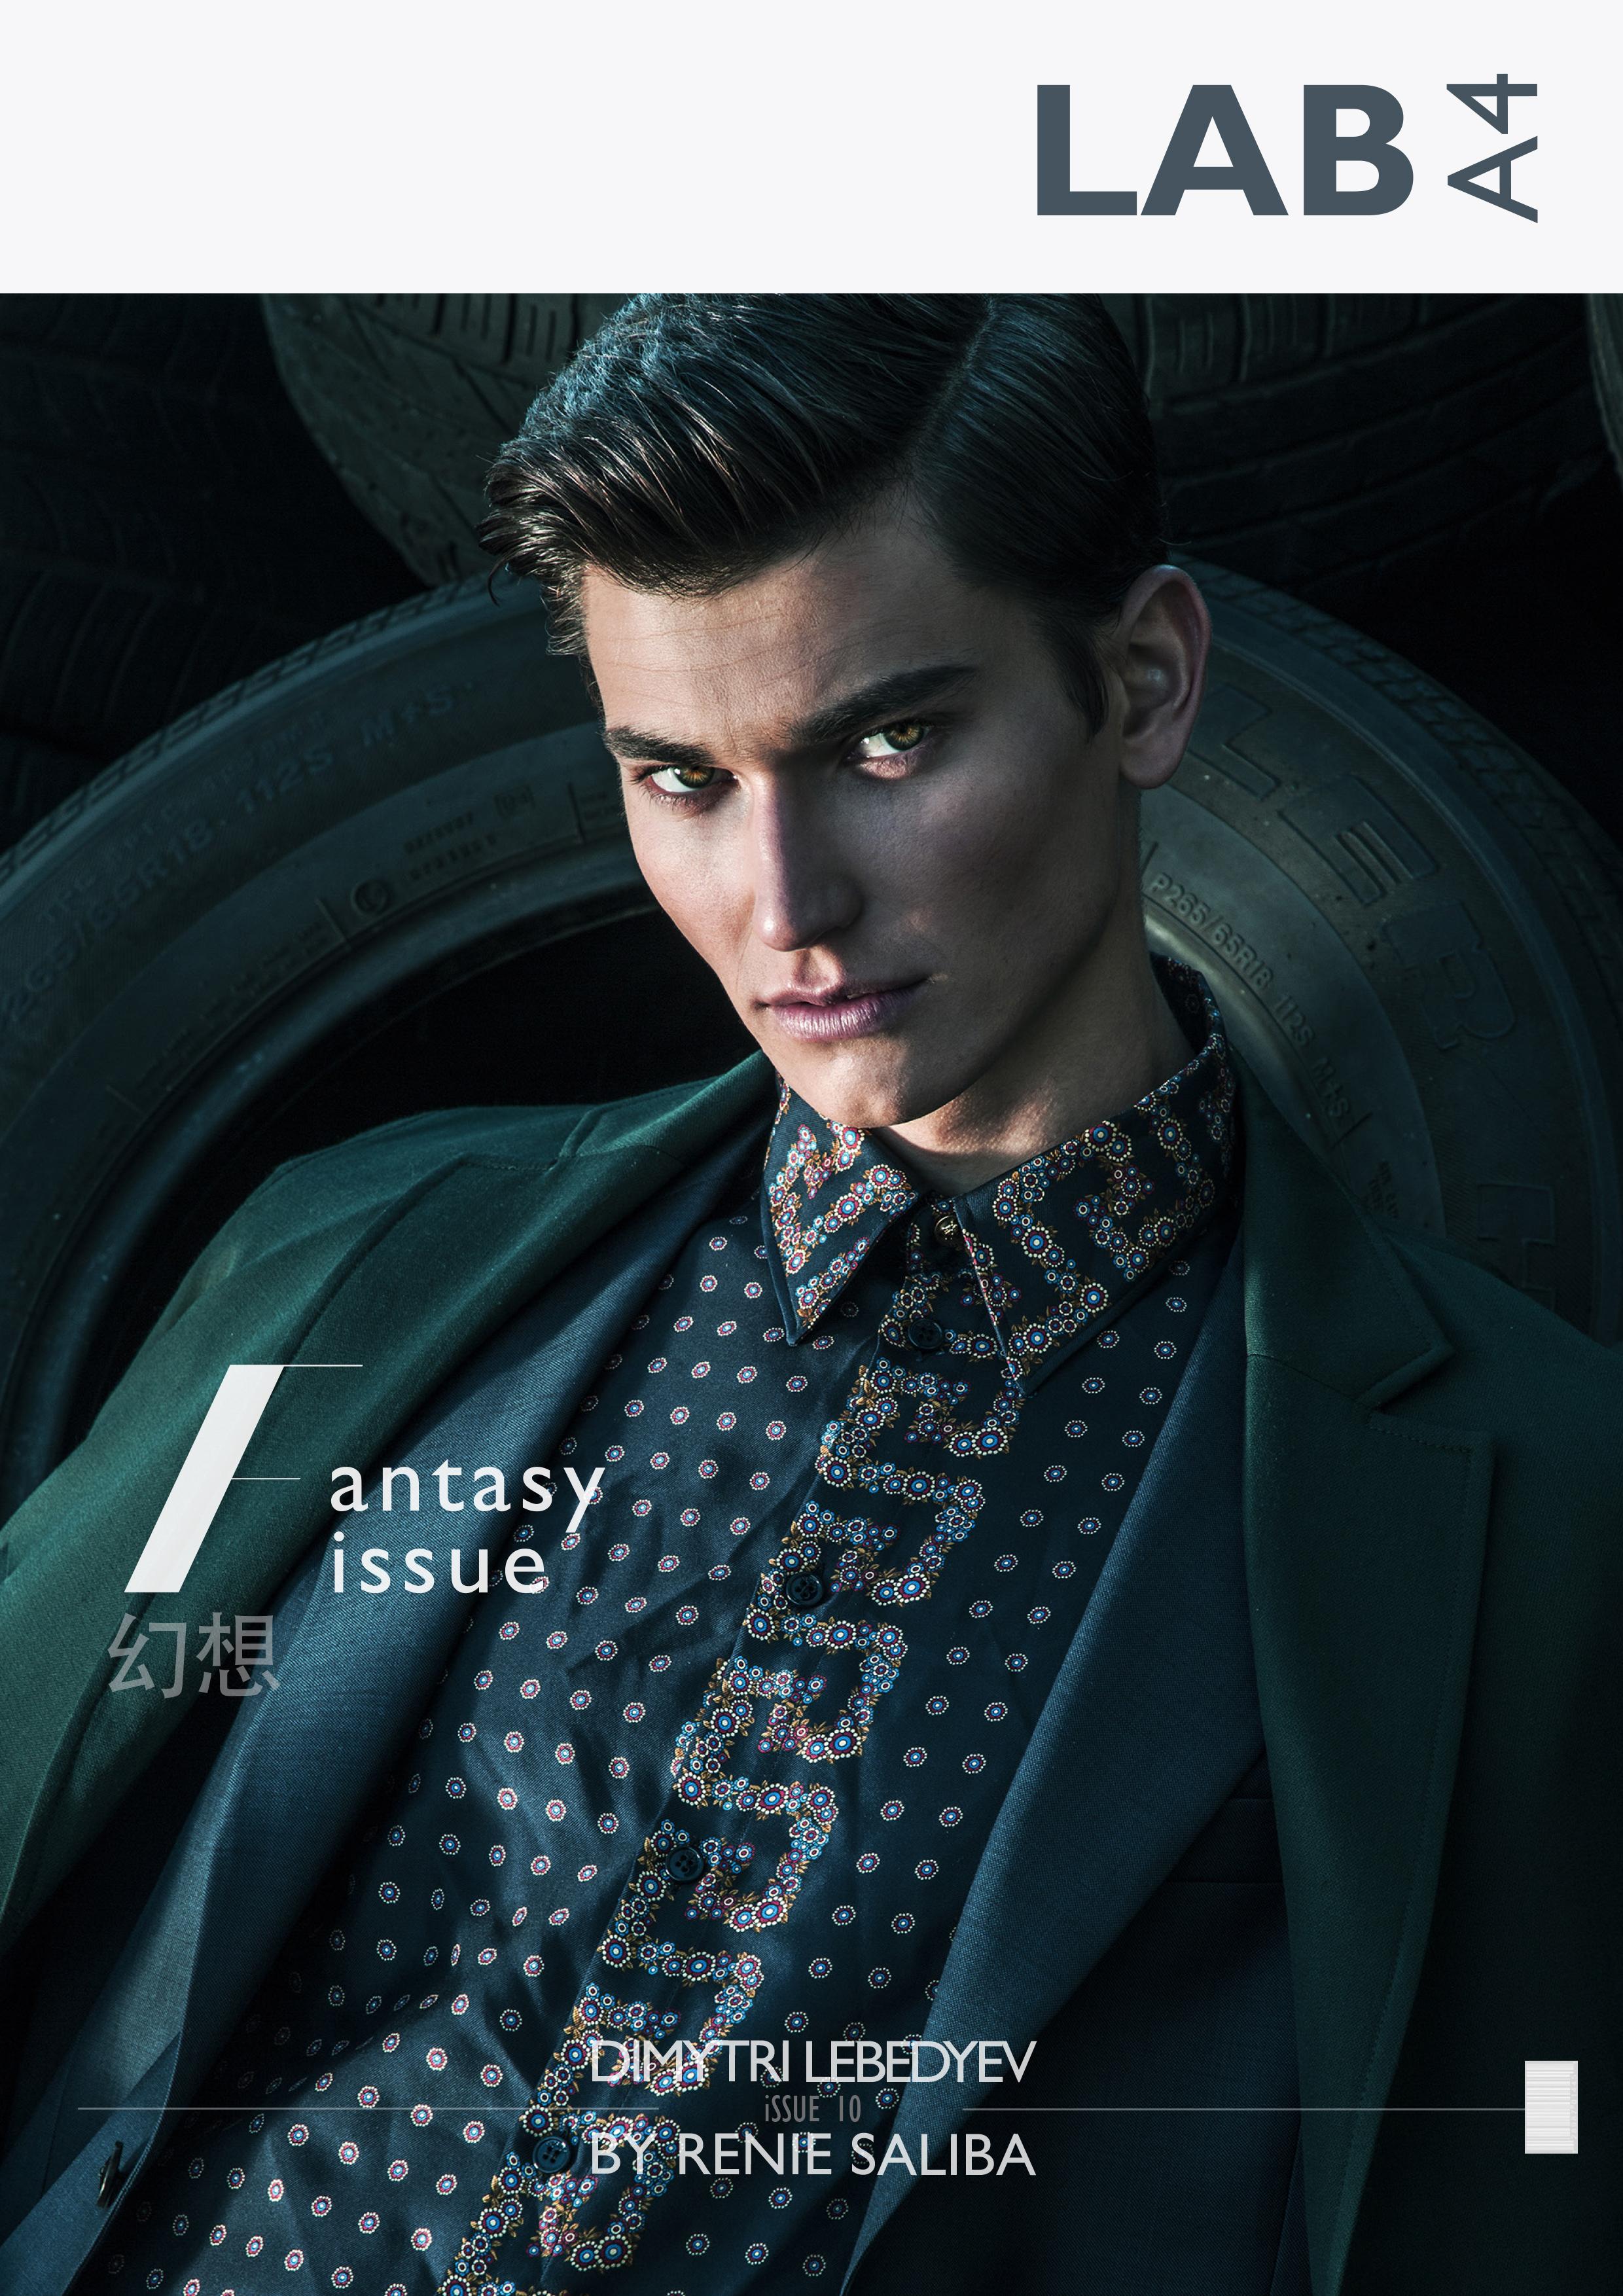 LAB A4 #10 Cover.jpg